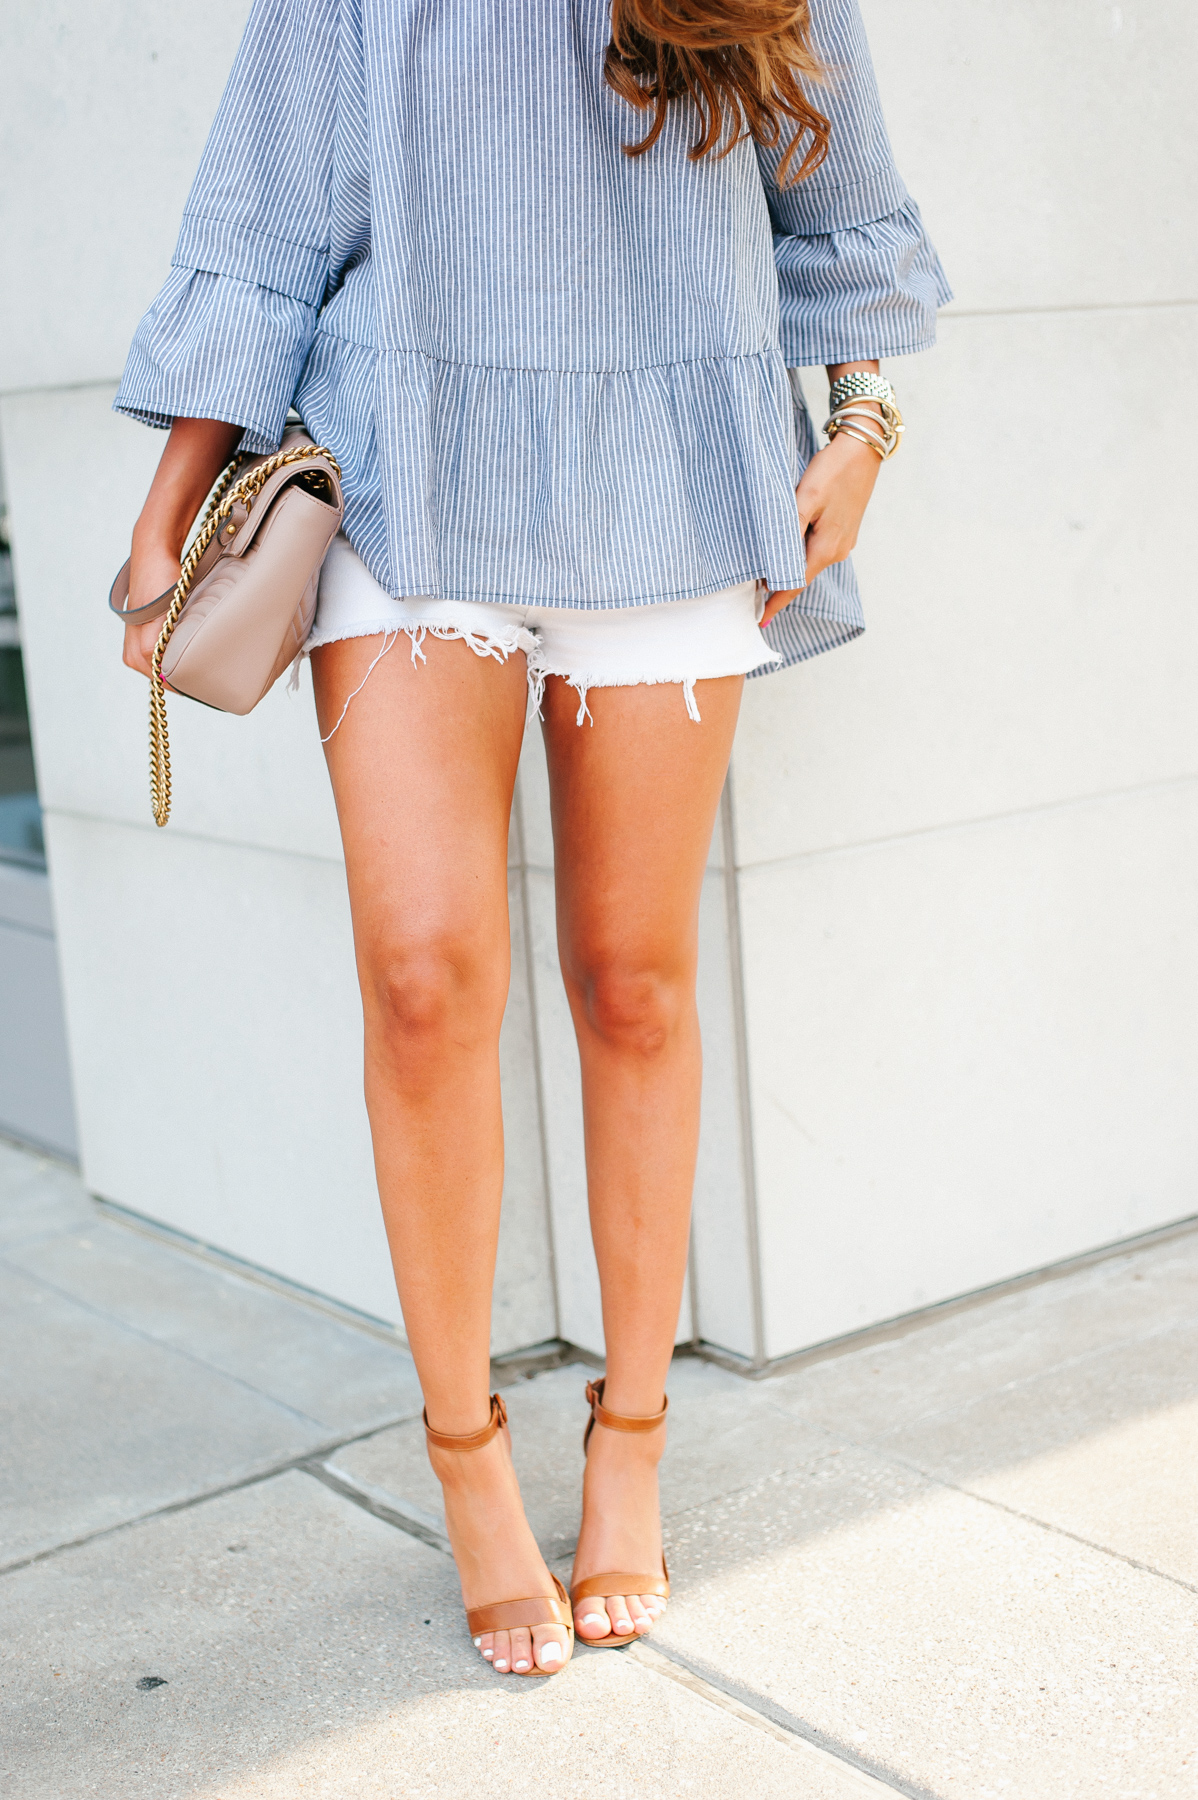 Dress Up Buttercup, Dede Raad, Houston Blogger, Fashion blogger